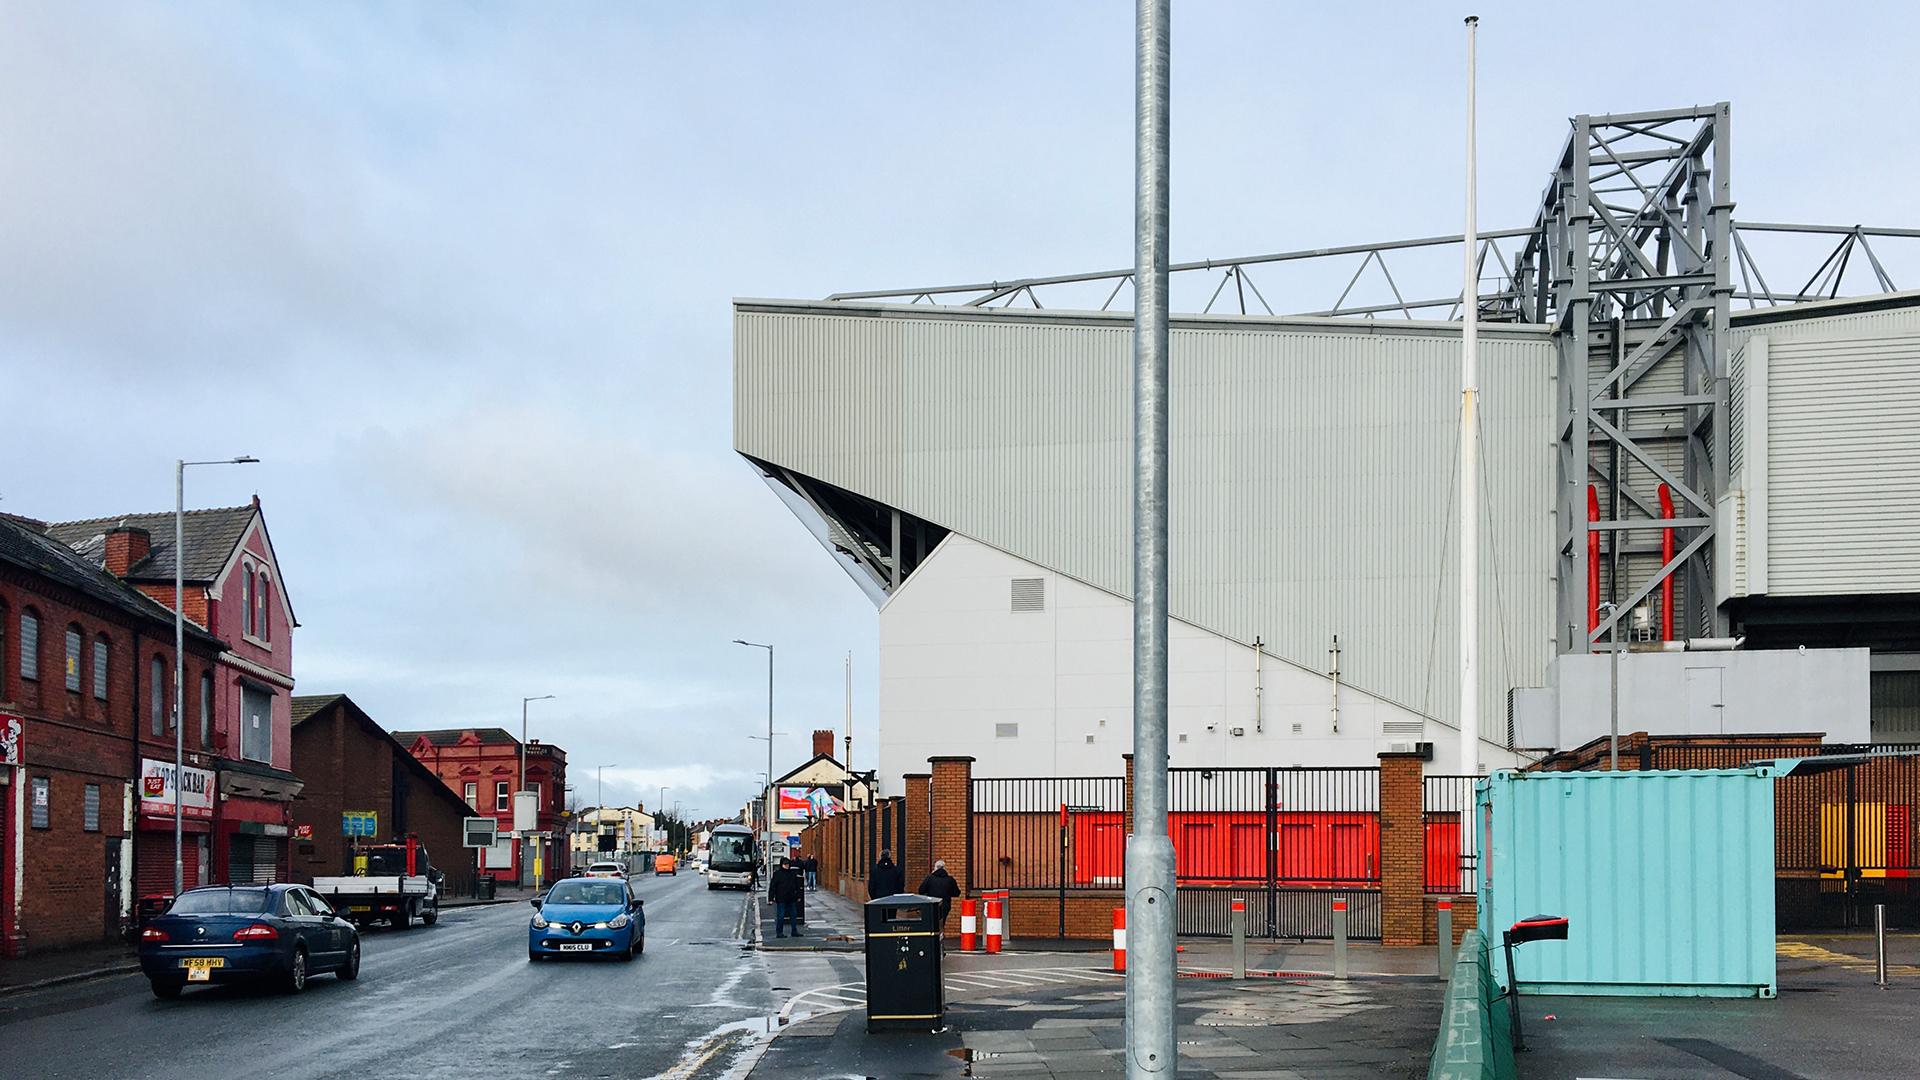 Anfield, England